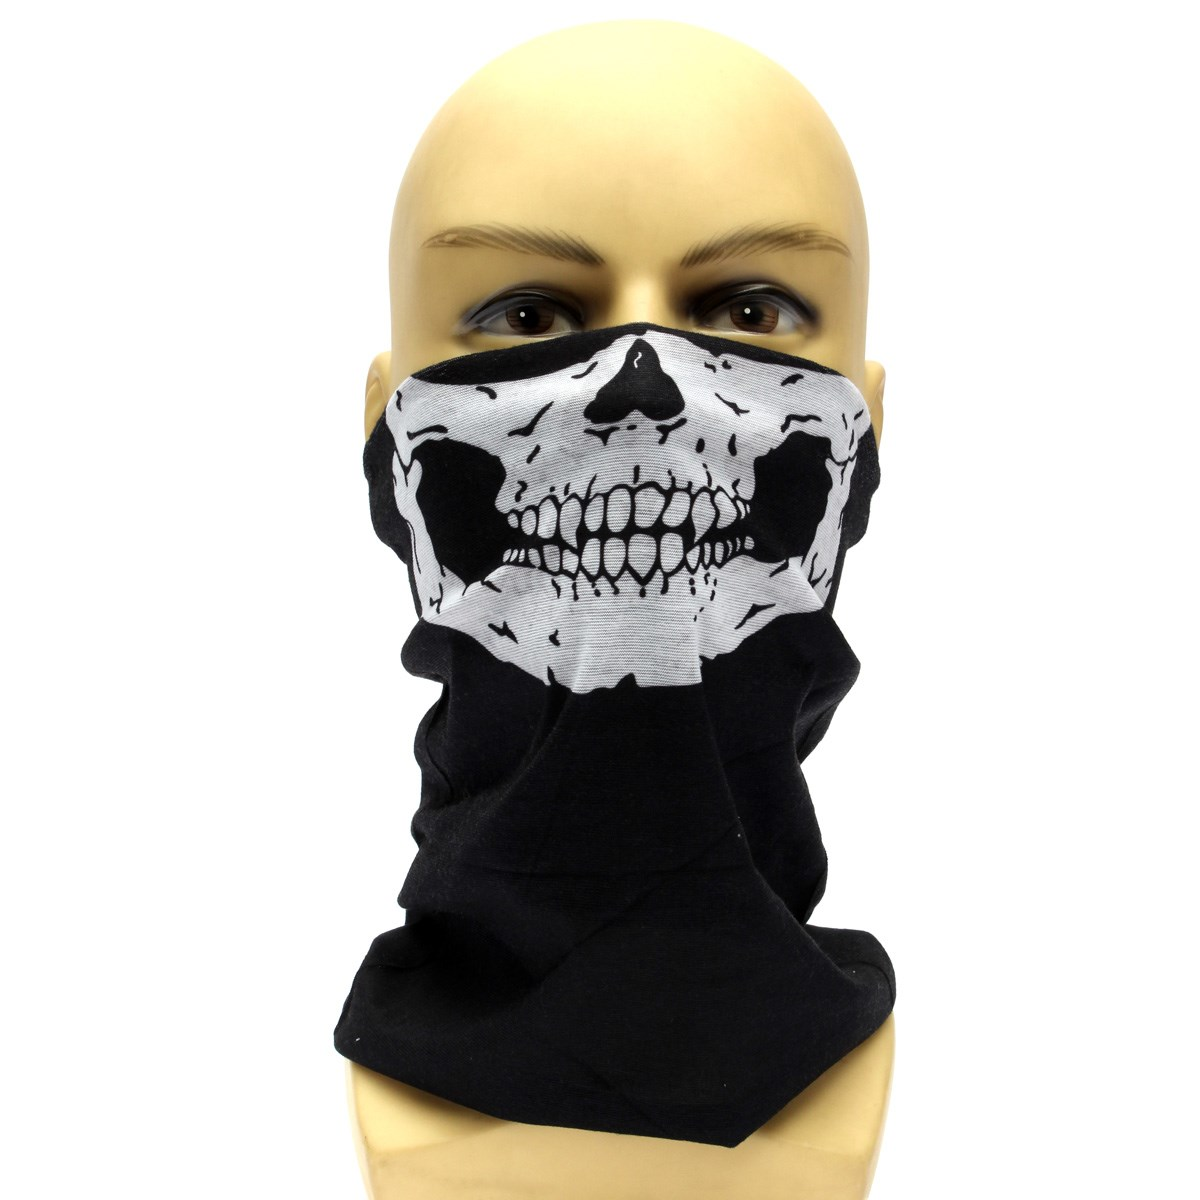 Popular Biker Mask-Buy Cheap Biker Mask lots from China Biker Mask ...